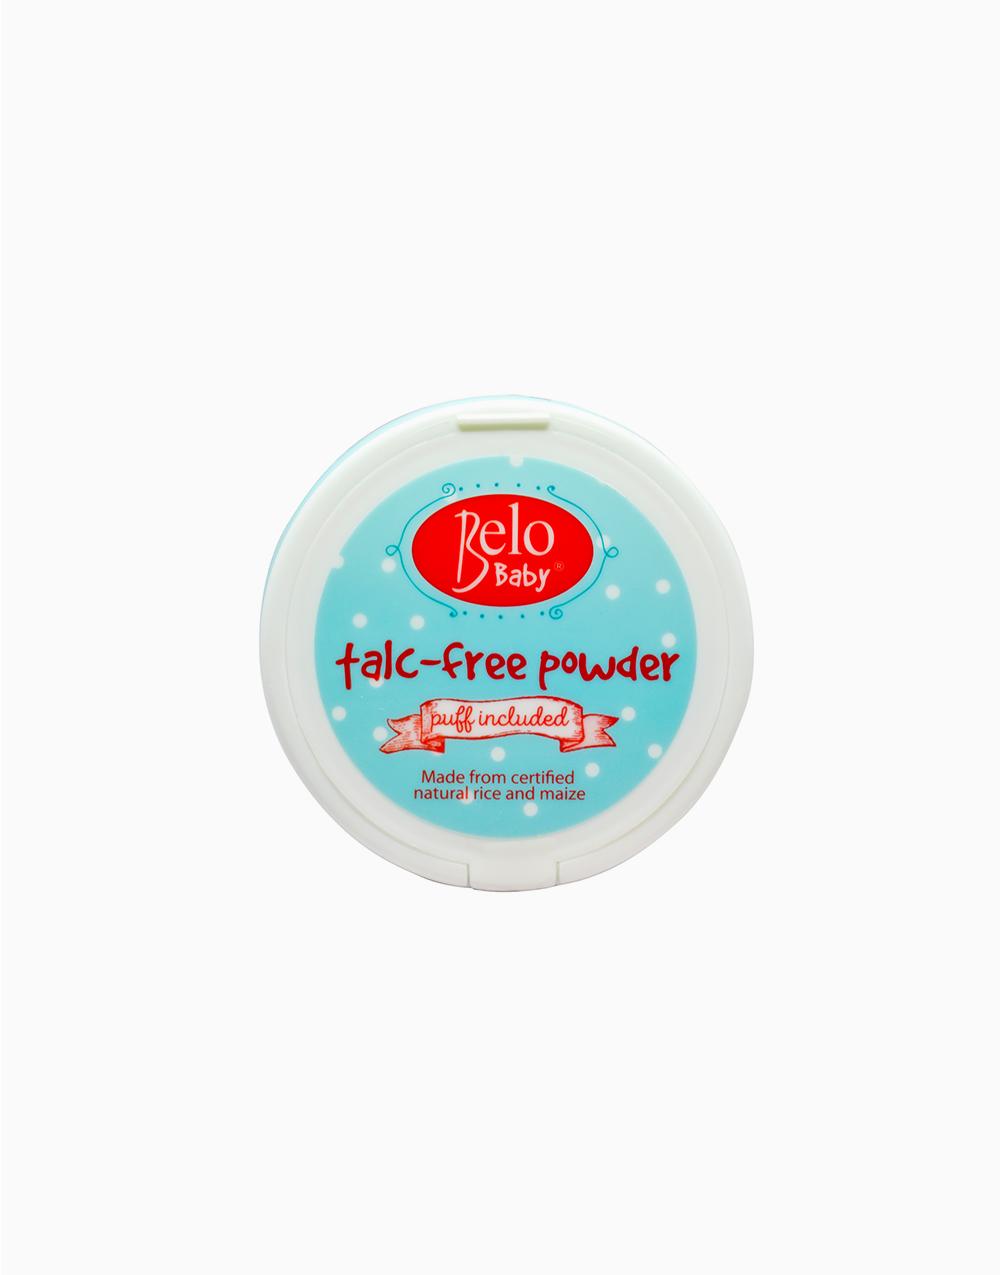 Belo Baby Talc-Free Powder (65g) by Belo Baby